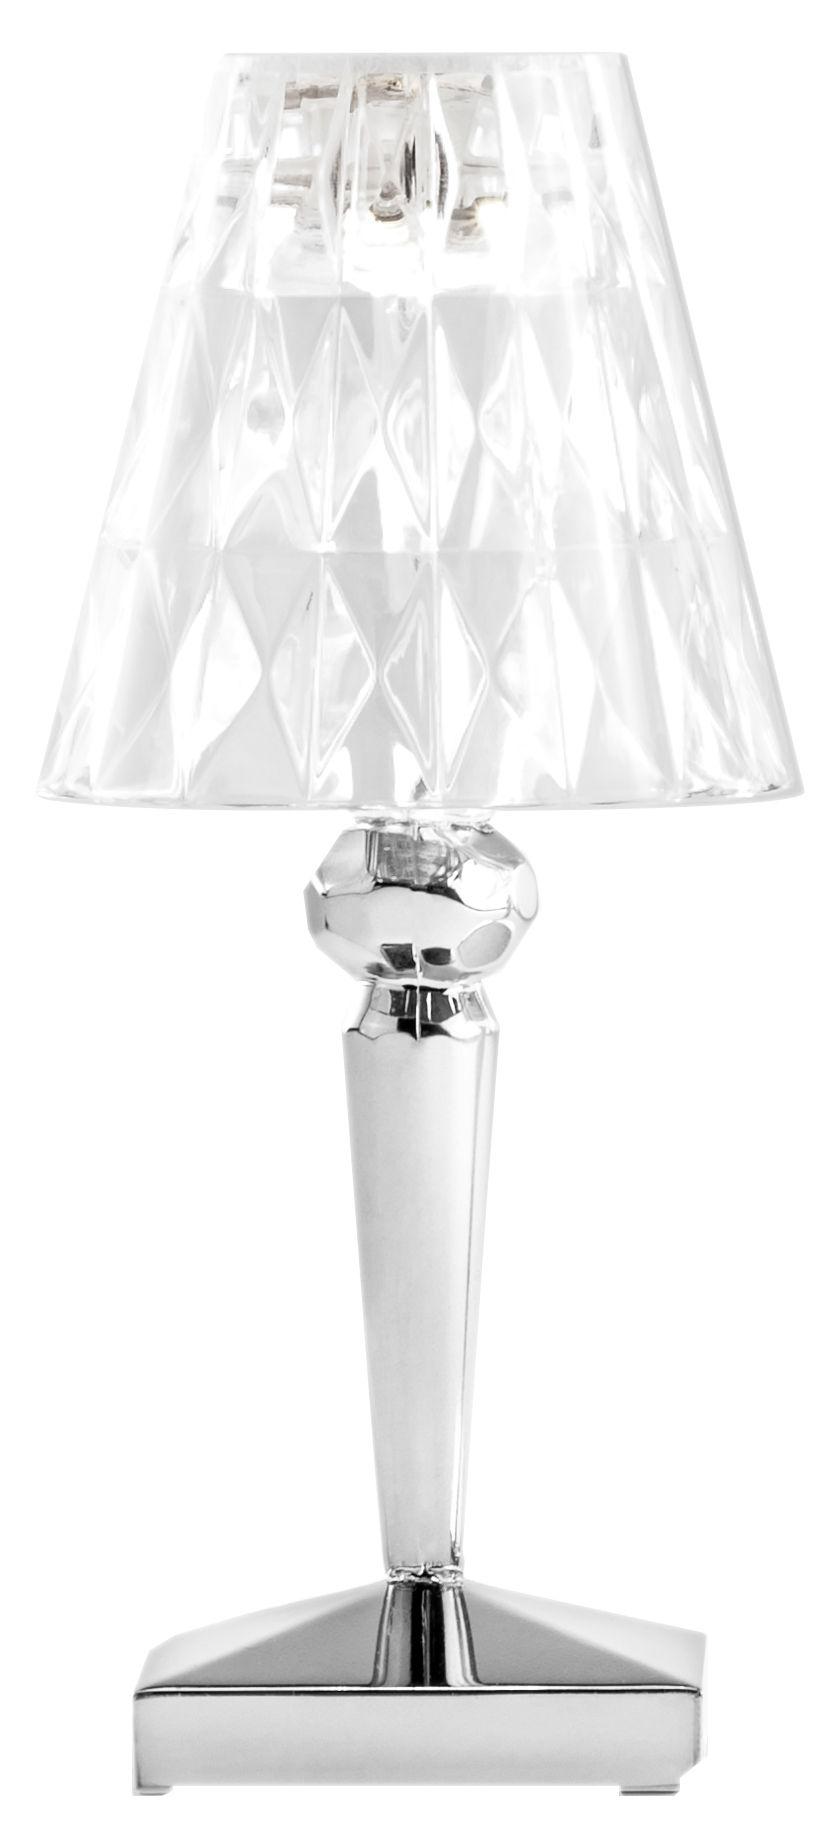 Scopri lampada senza fili battery led ricarica usb - Lampada da tavolo senza fili ...